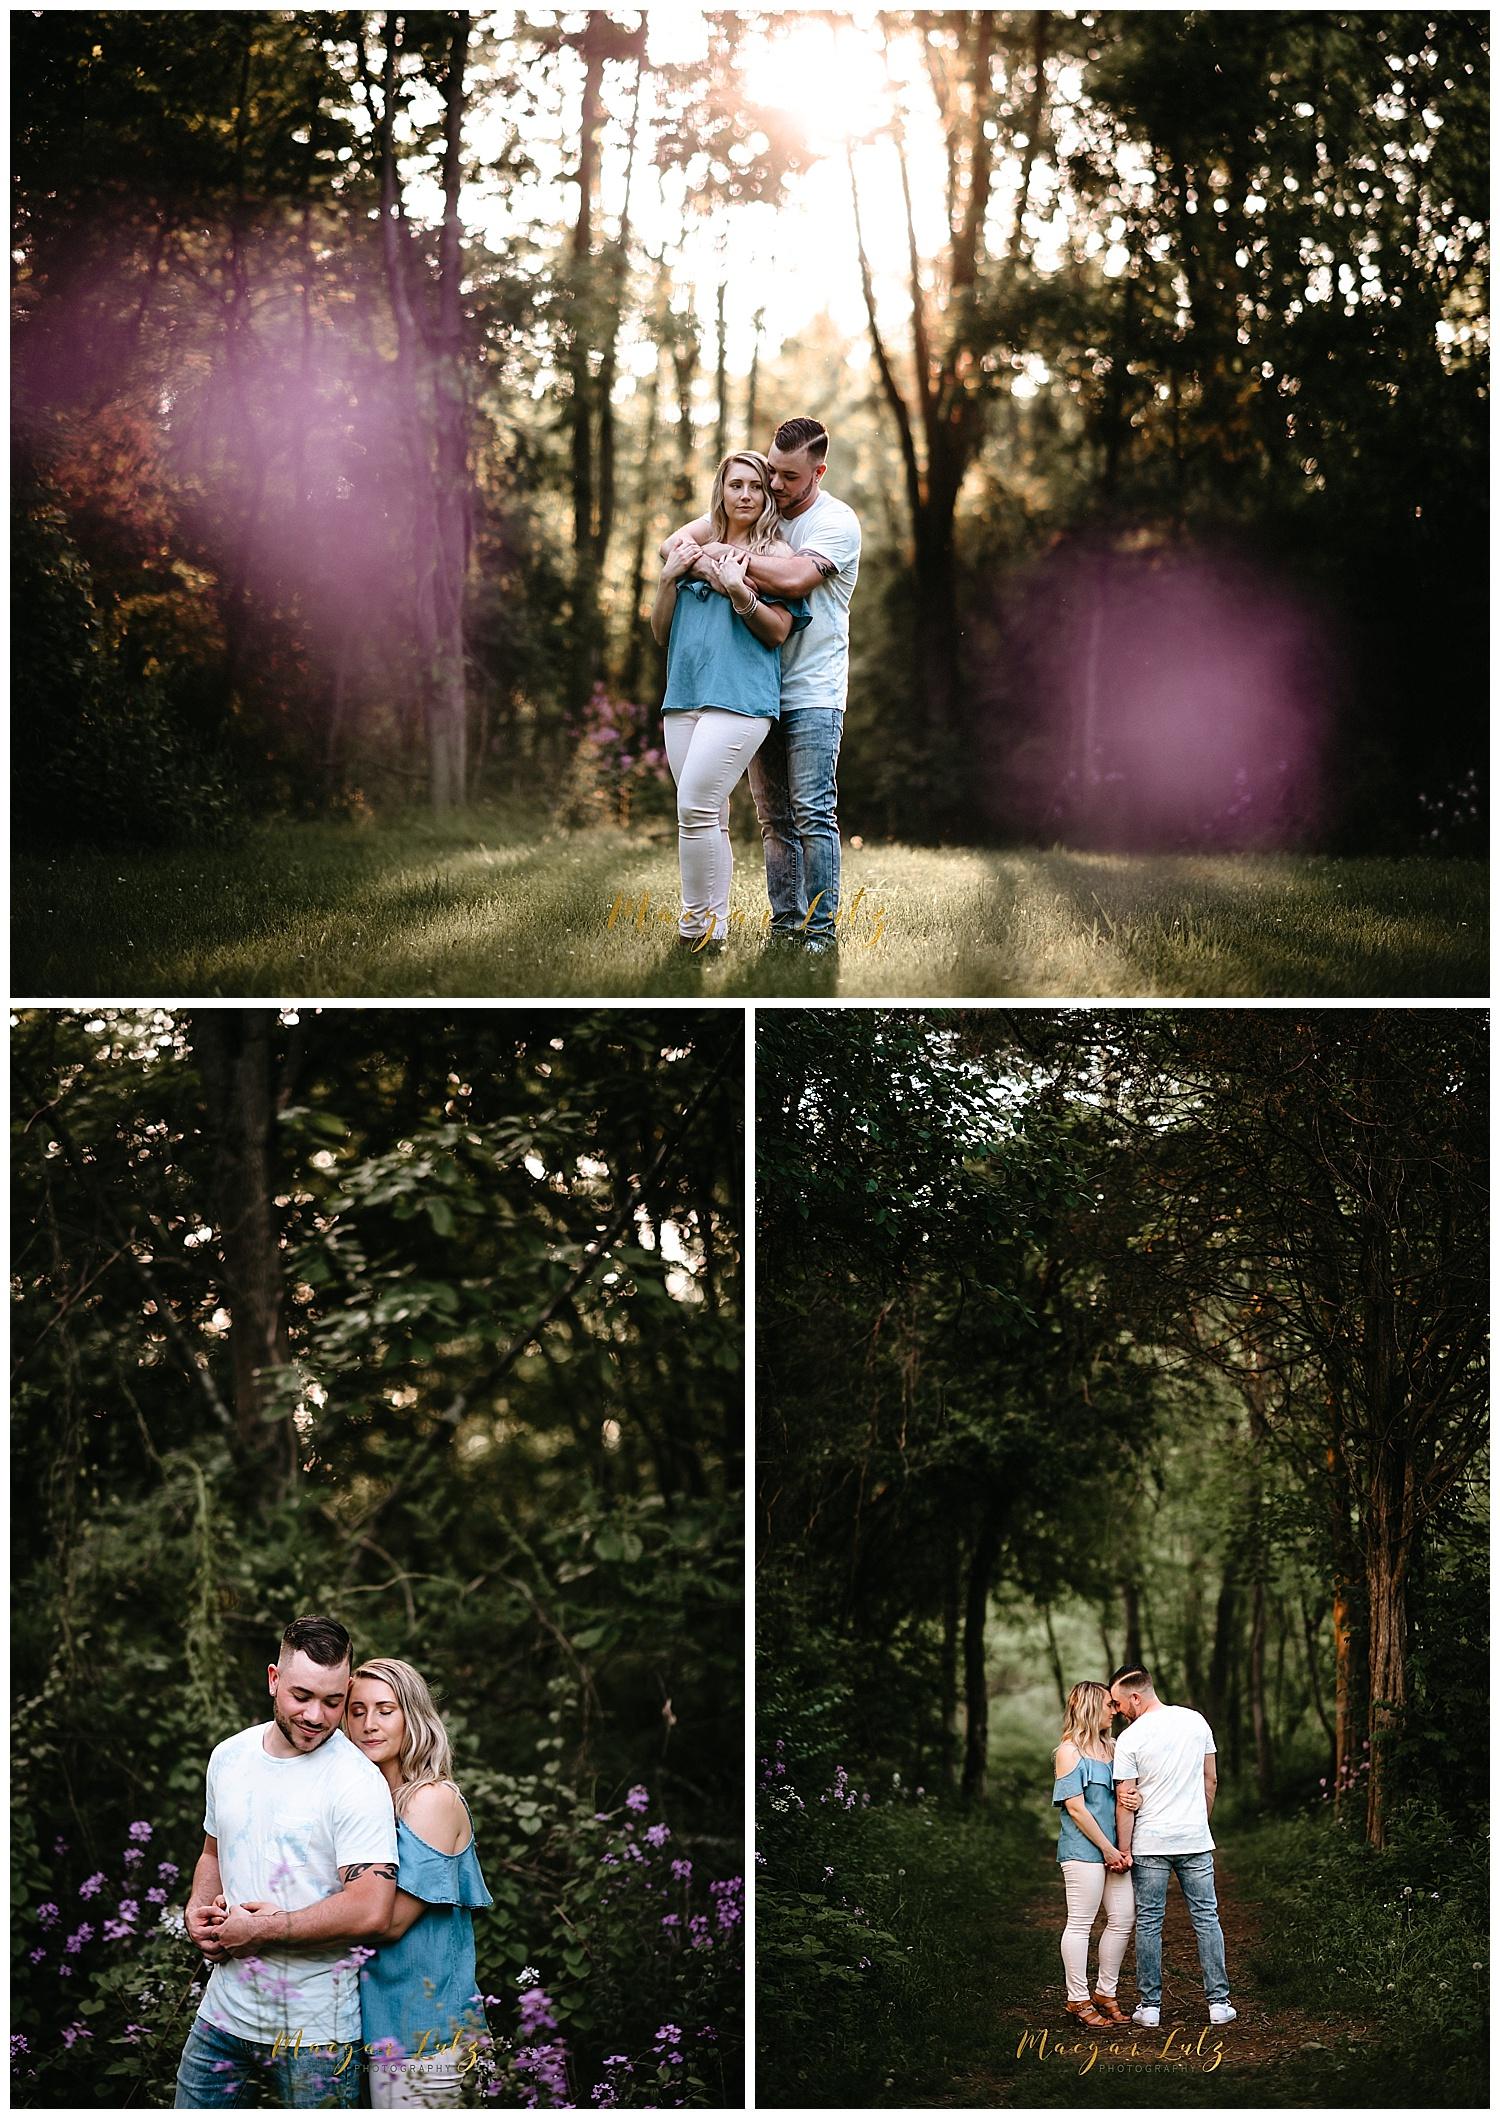 NEPA-wedding-engagement-photographer-Jacobsburg-state-park-Easton-PA_0046.jpg